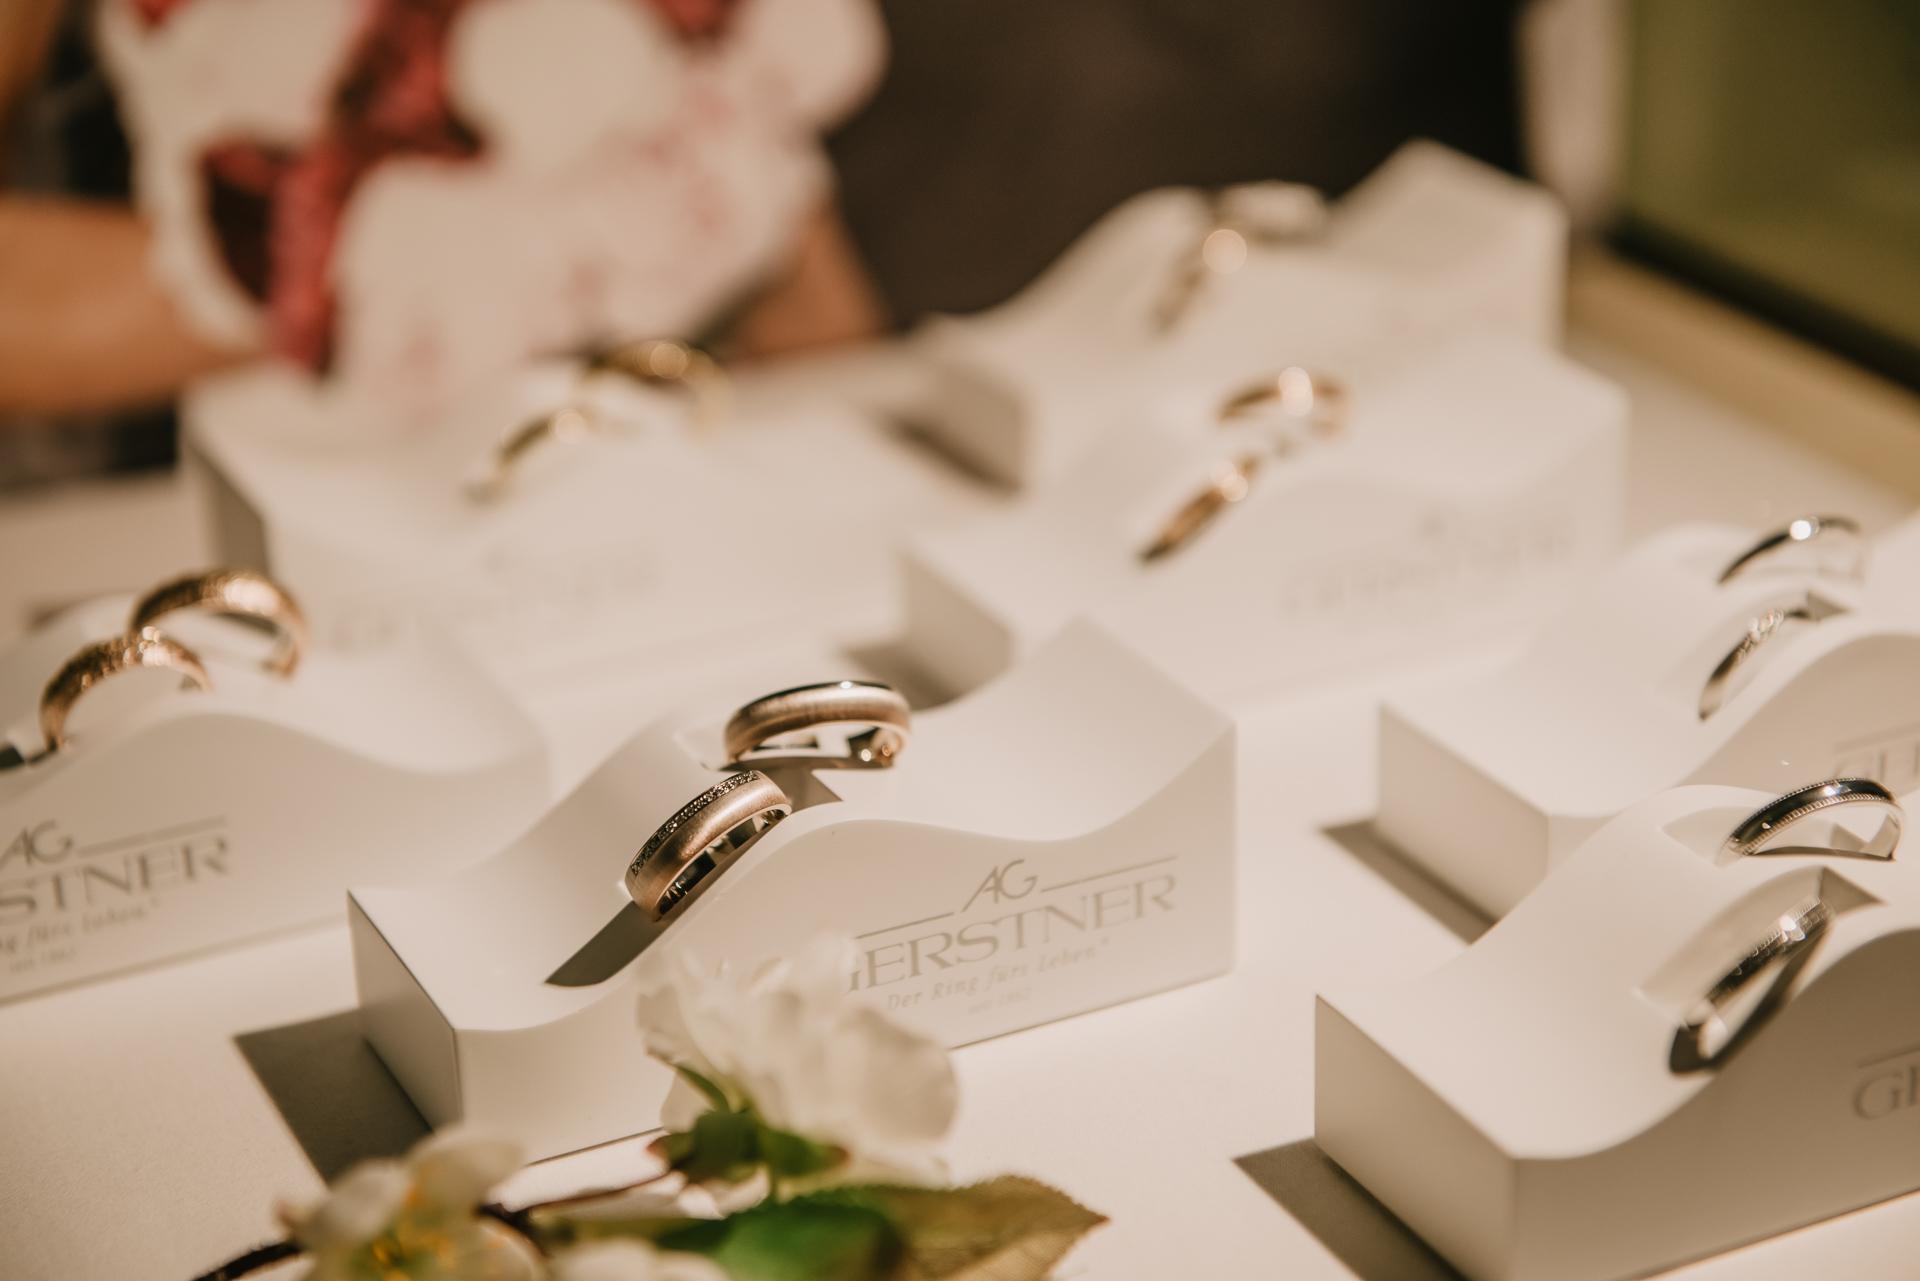 Zweinander-LeonoreHerzog-WeddingMarket-OnTour20191110-9665